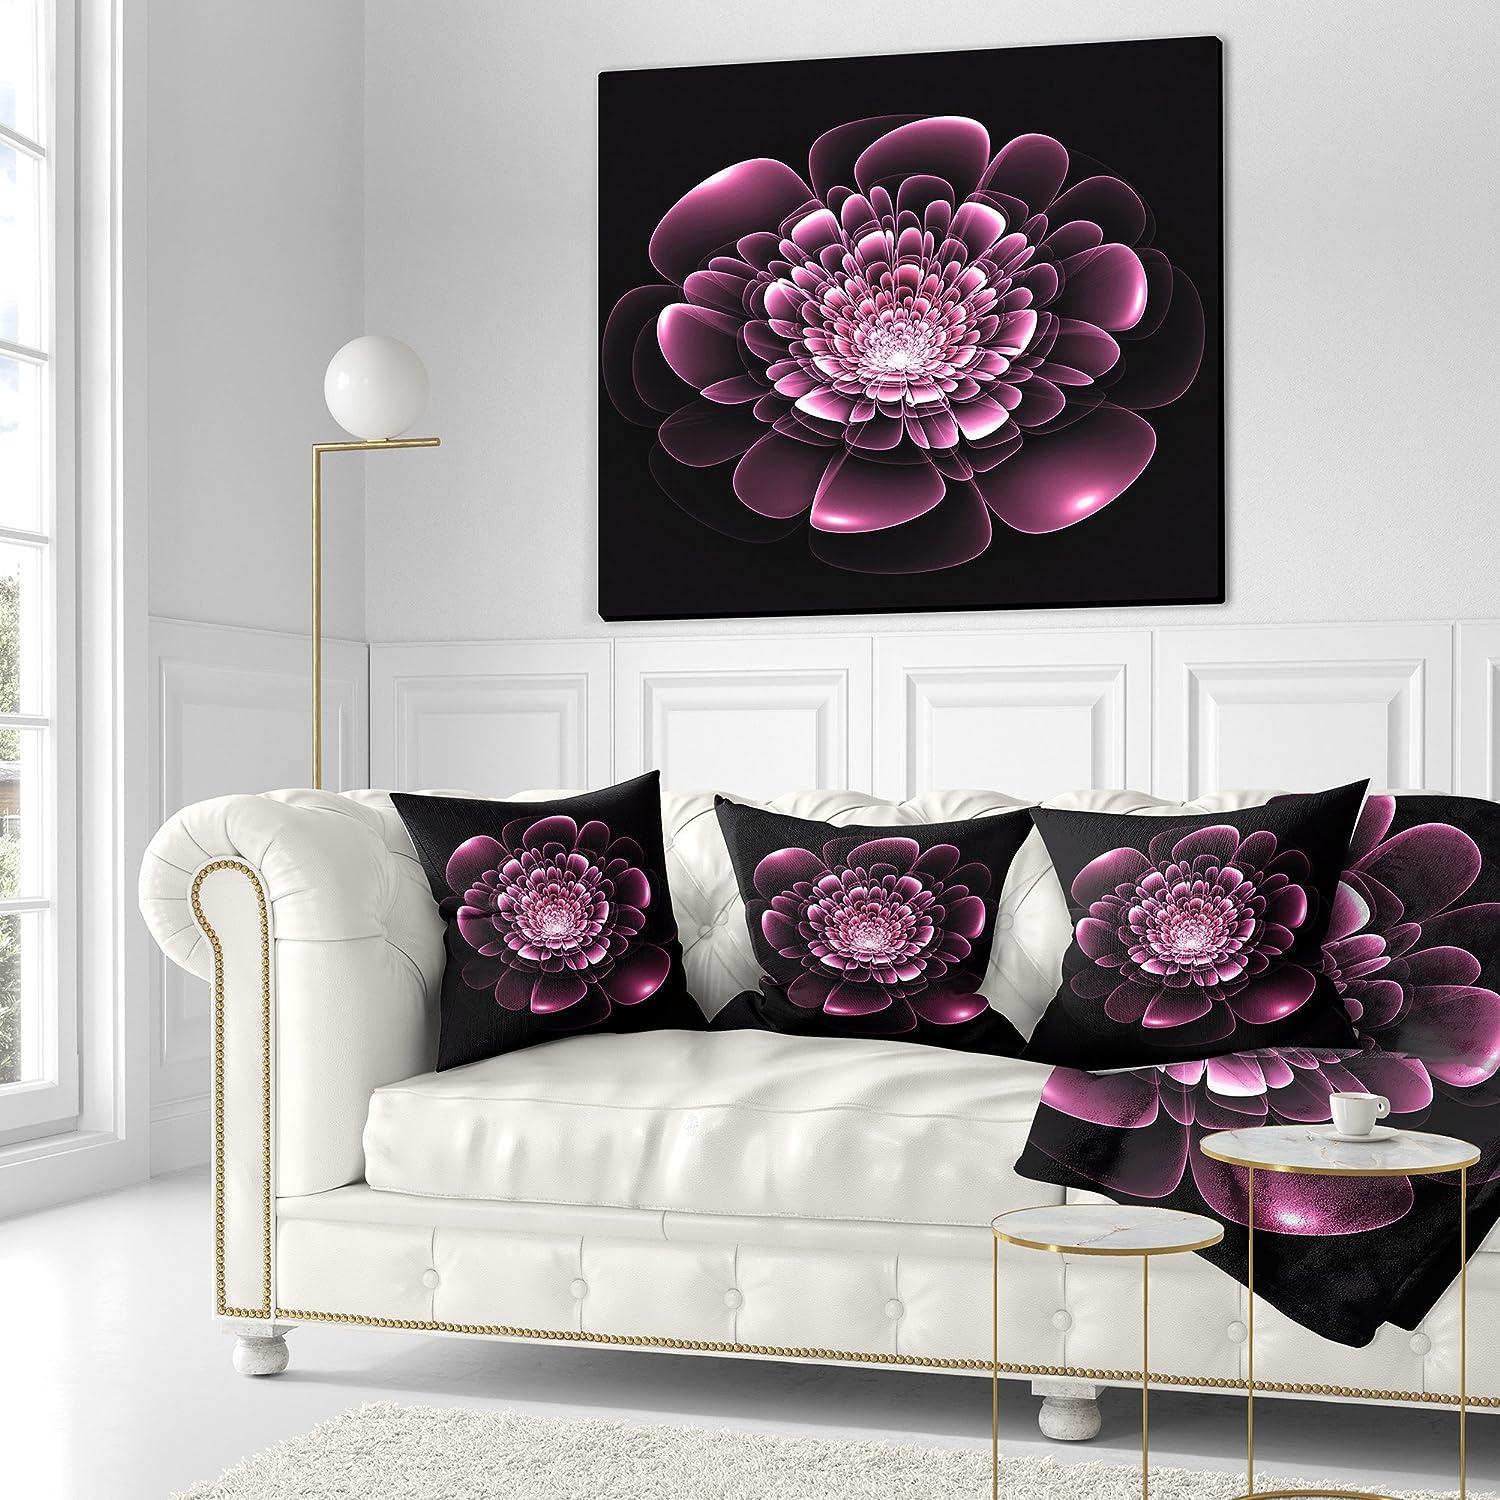 26 Round Floor Pillow Kess InHouse Geordanna Fields Kala II Gold Pink Abstract